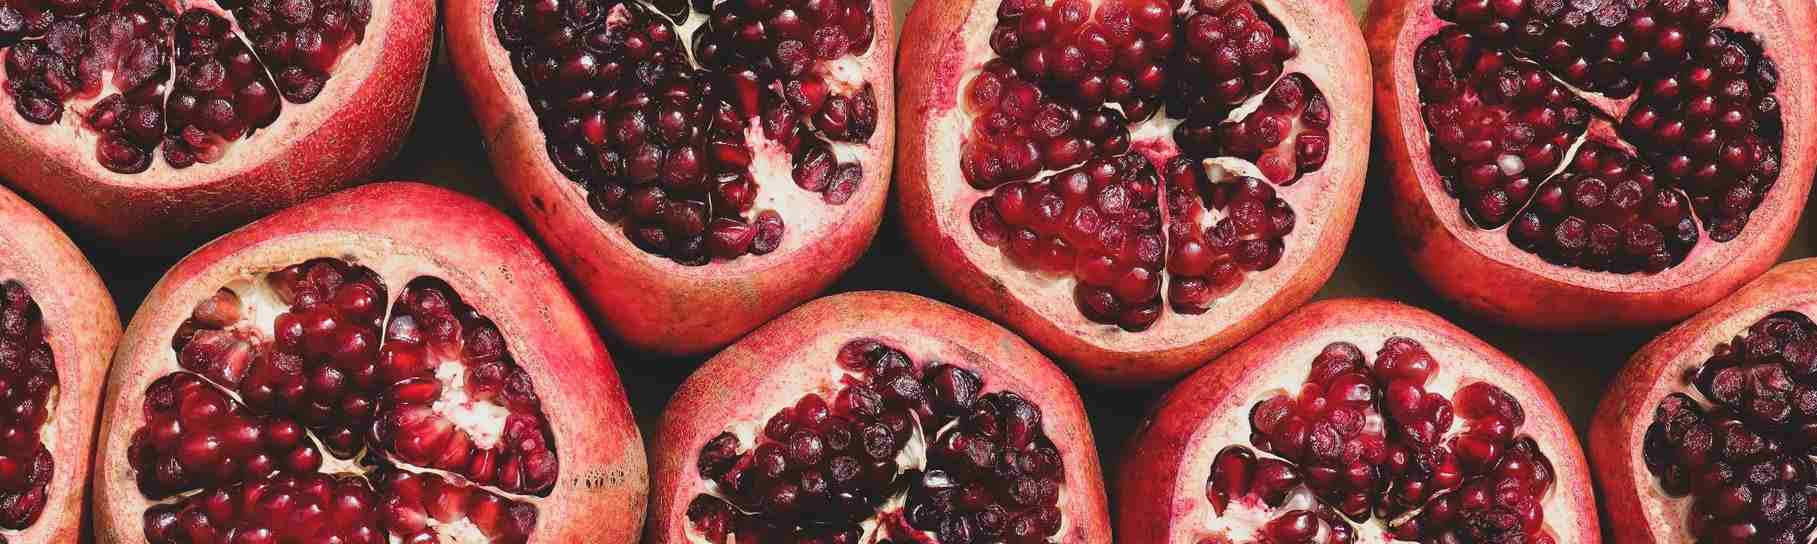 Fresh Pomegranates   Breast Cancer Car Donations